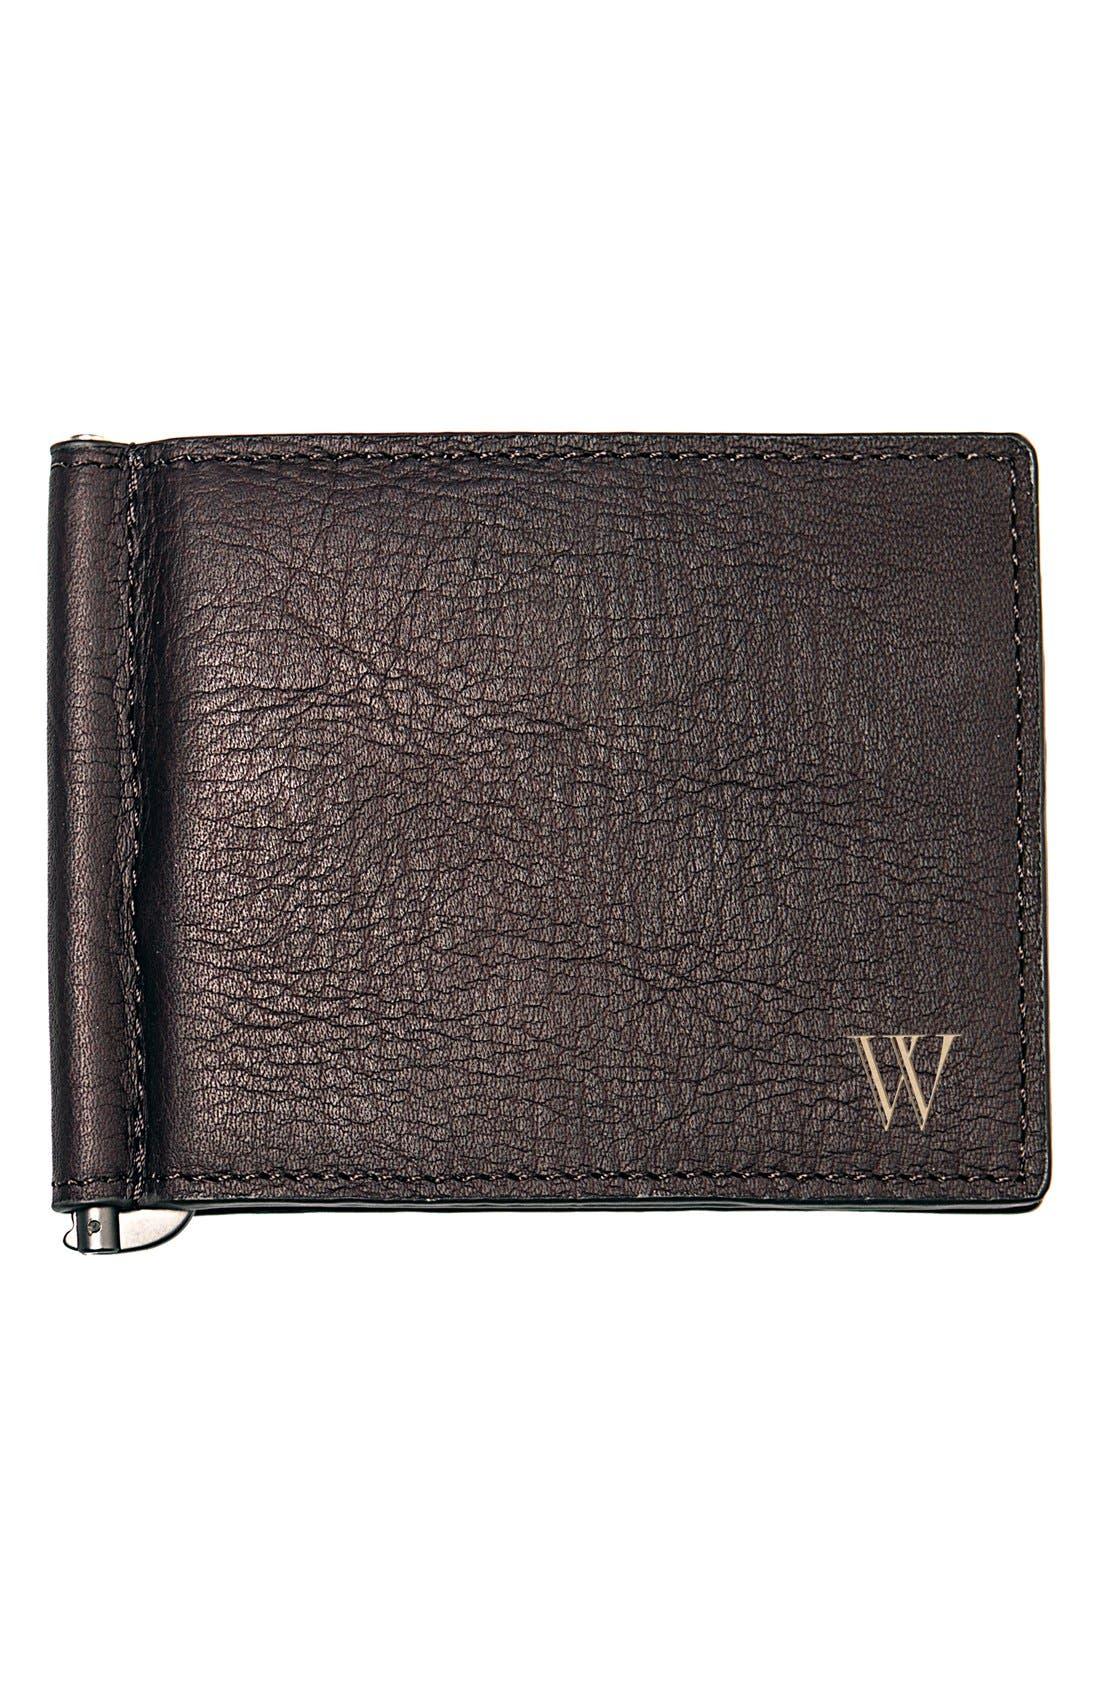 Cathy's Concepts Monogram Leather Wallet & Money Clip